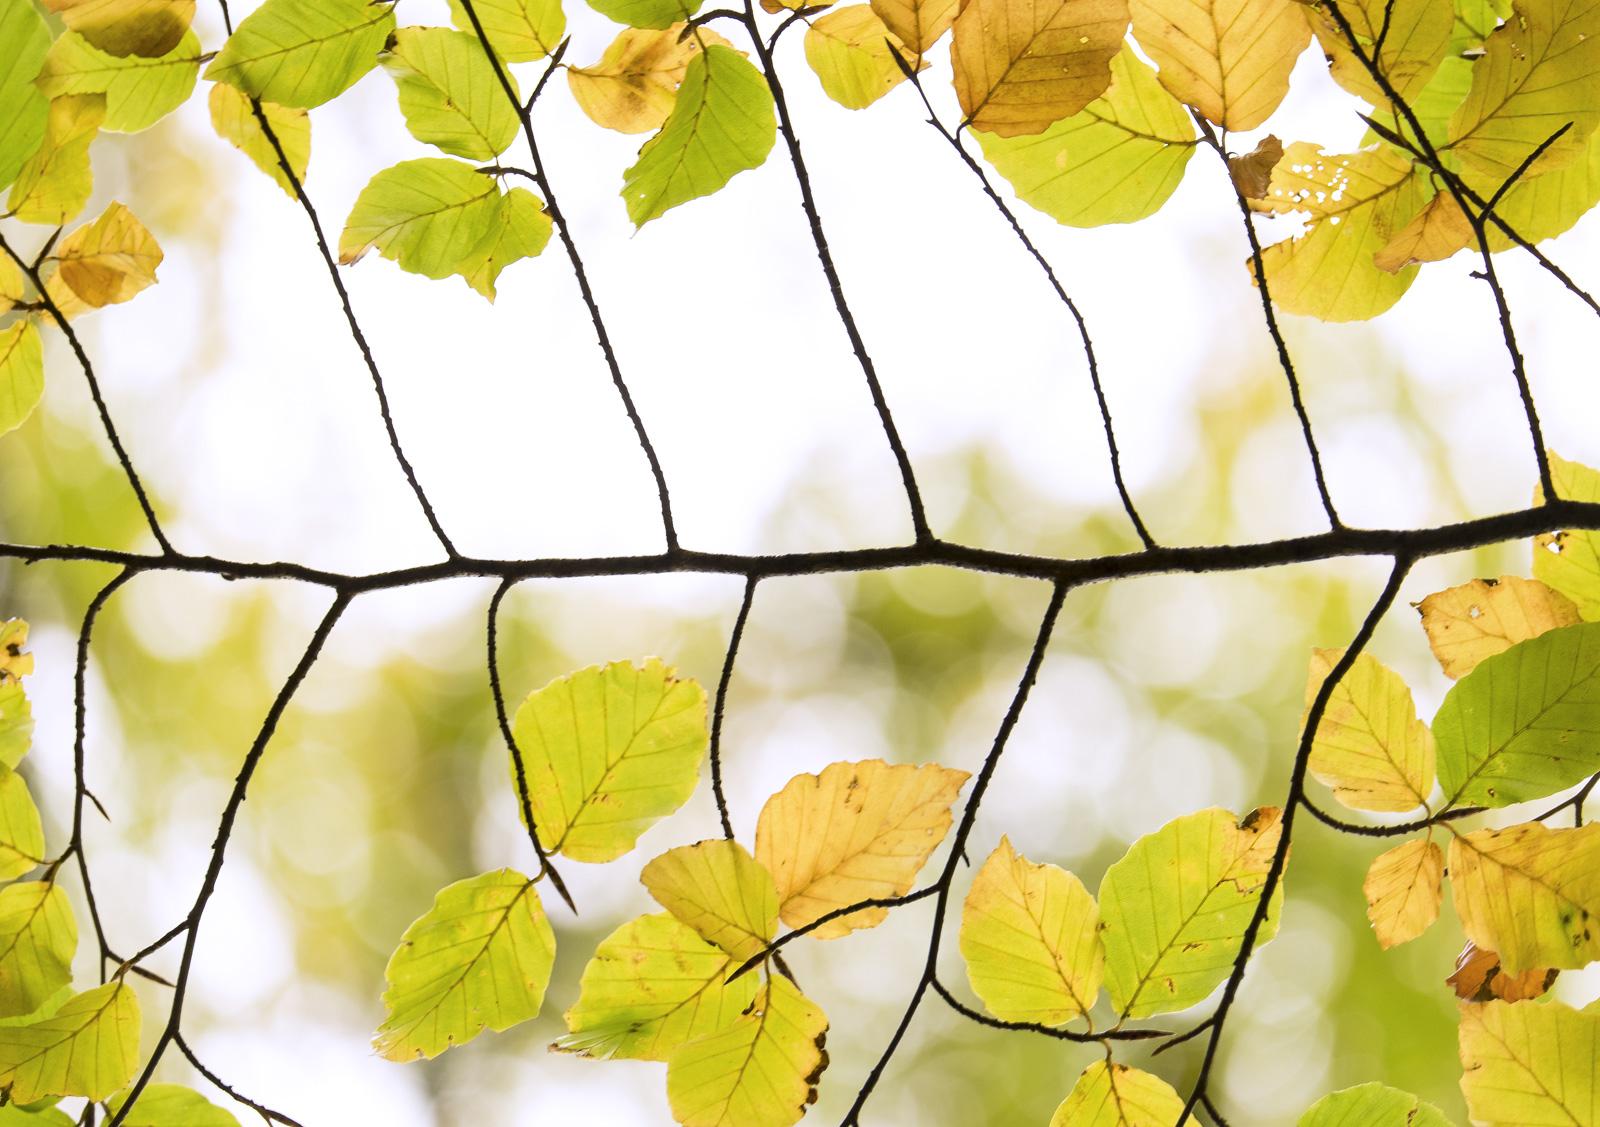 Beech Ladder 3, Glencoe, Highlands, Scotland, highlights, leaf, leaves, twigs, translucent, luminosity, ladder, skeletal, photo